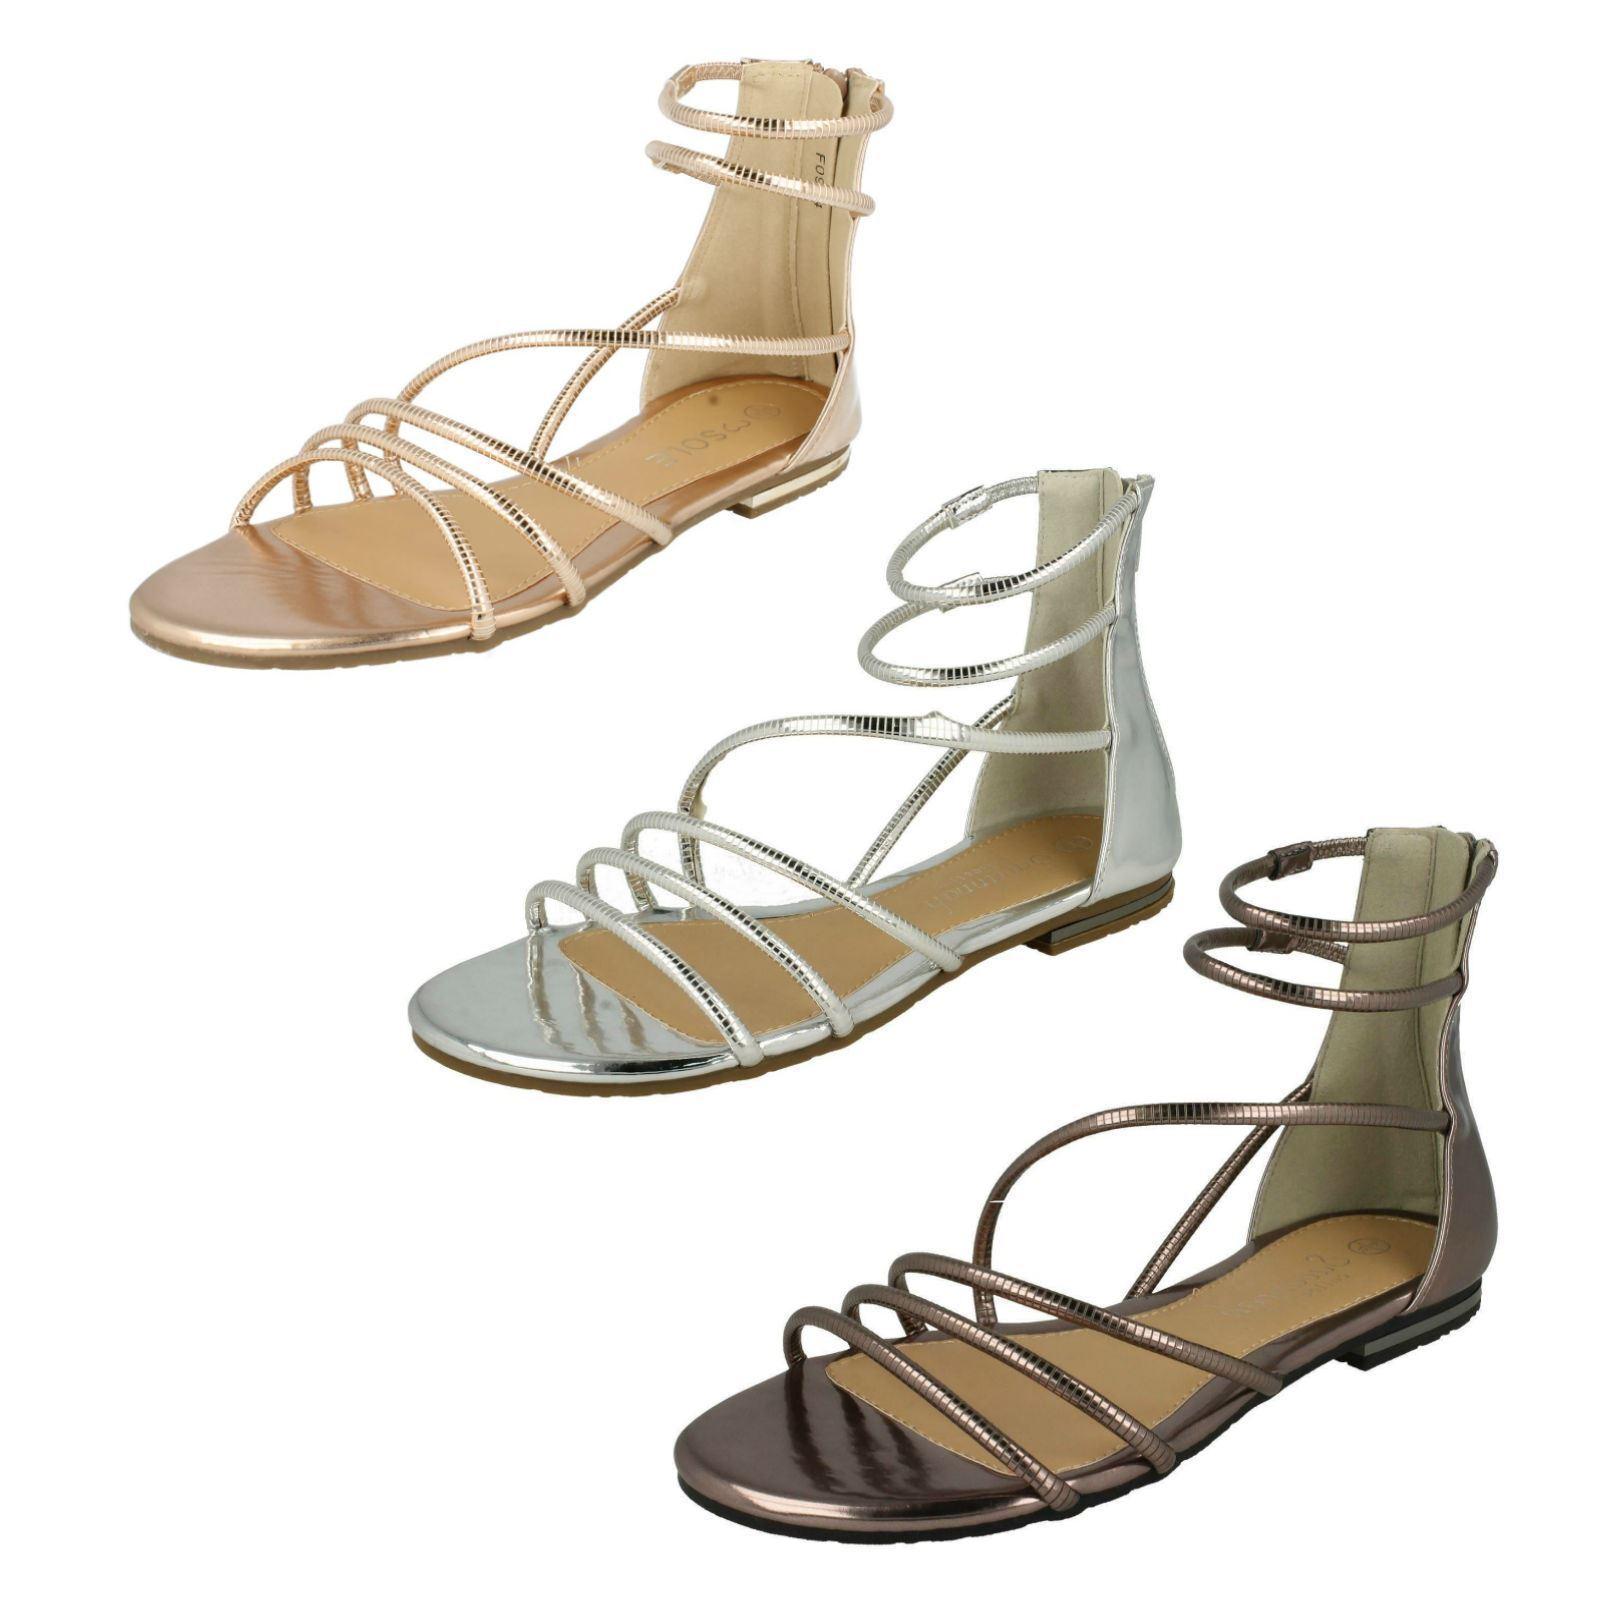 Ladies By F0R974 Gladiator Sandals By Ladies Savannah Collection Retail Price 5c49c2